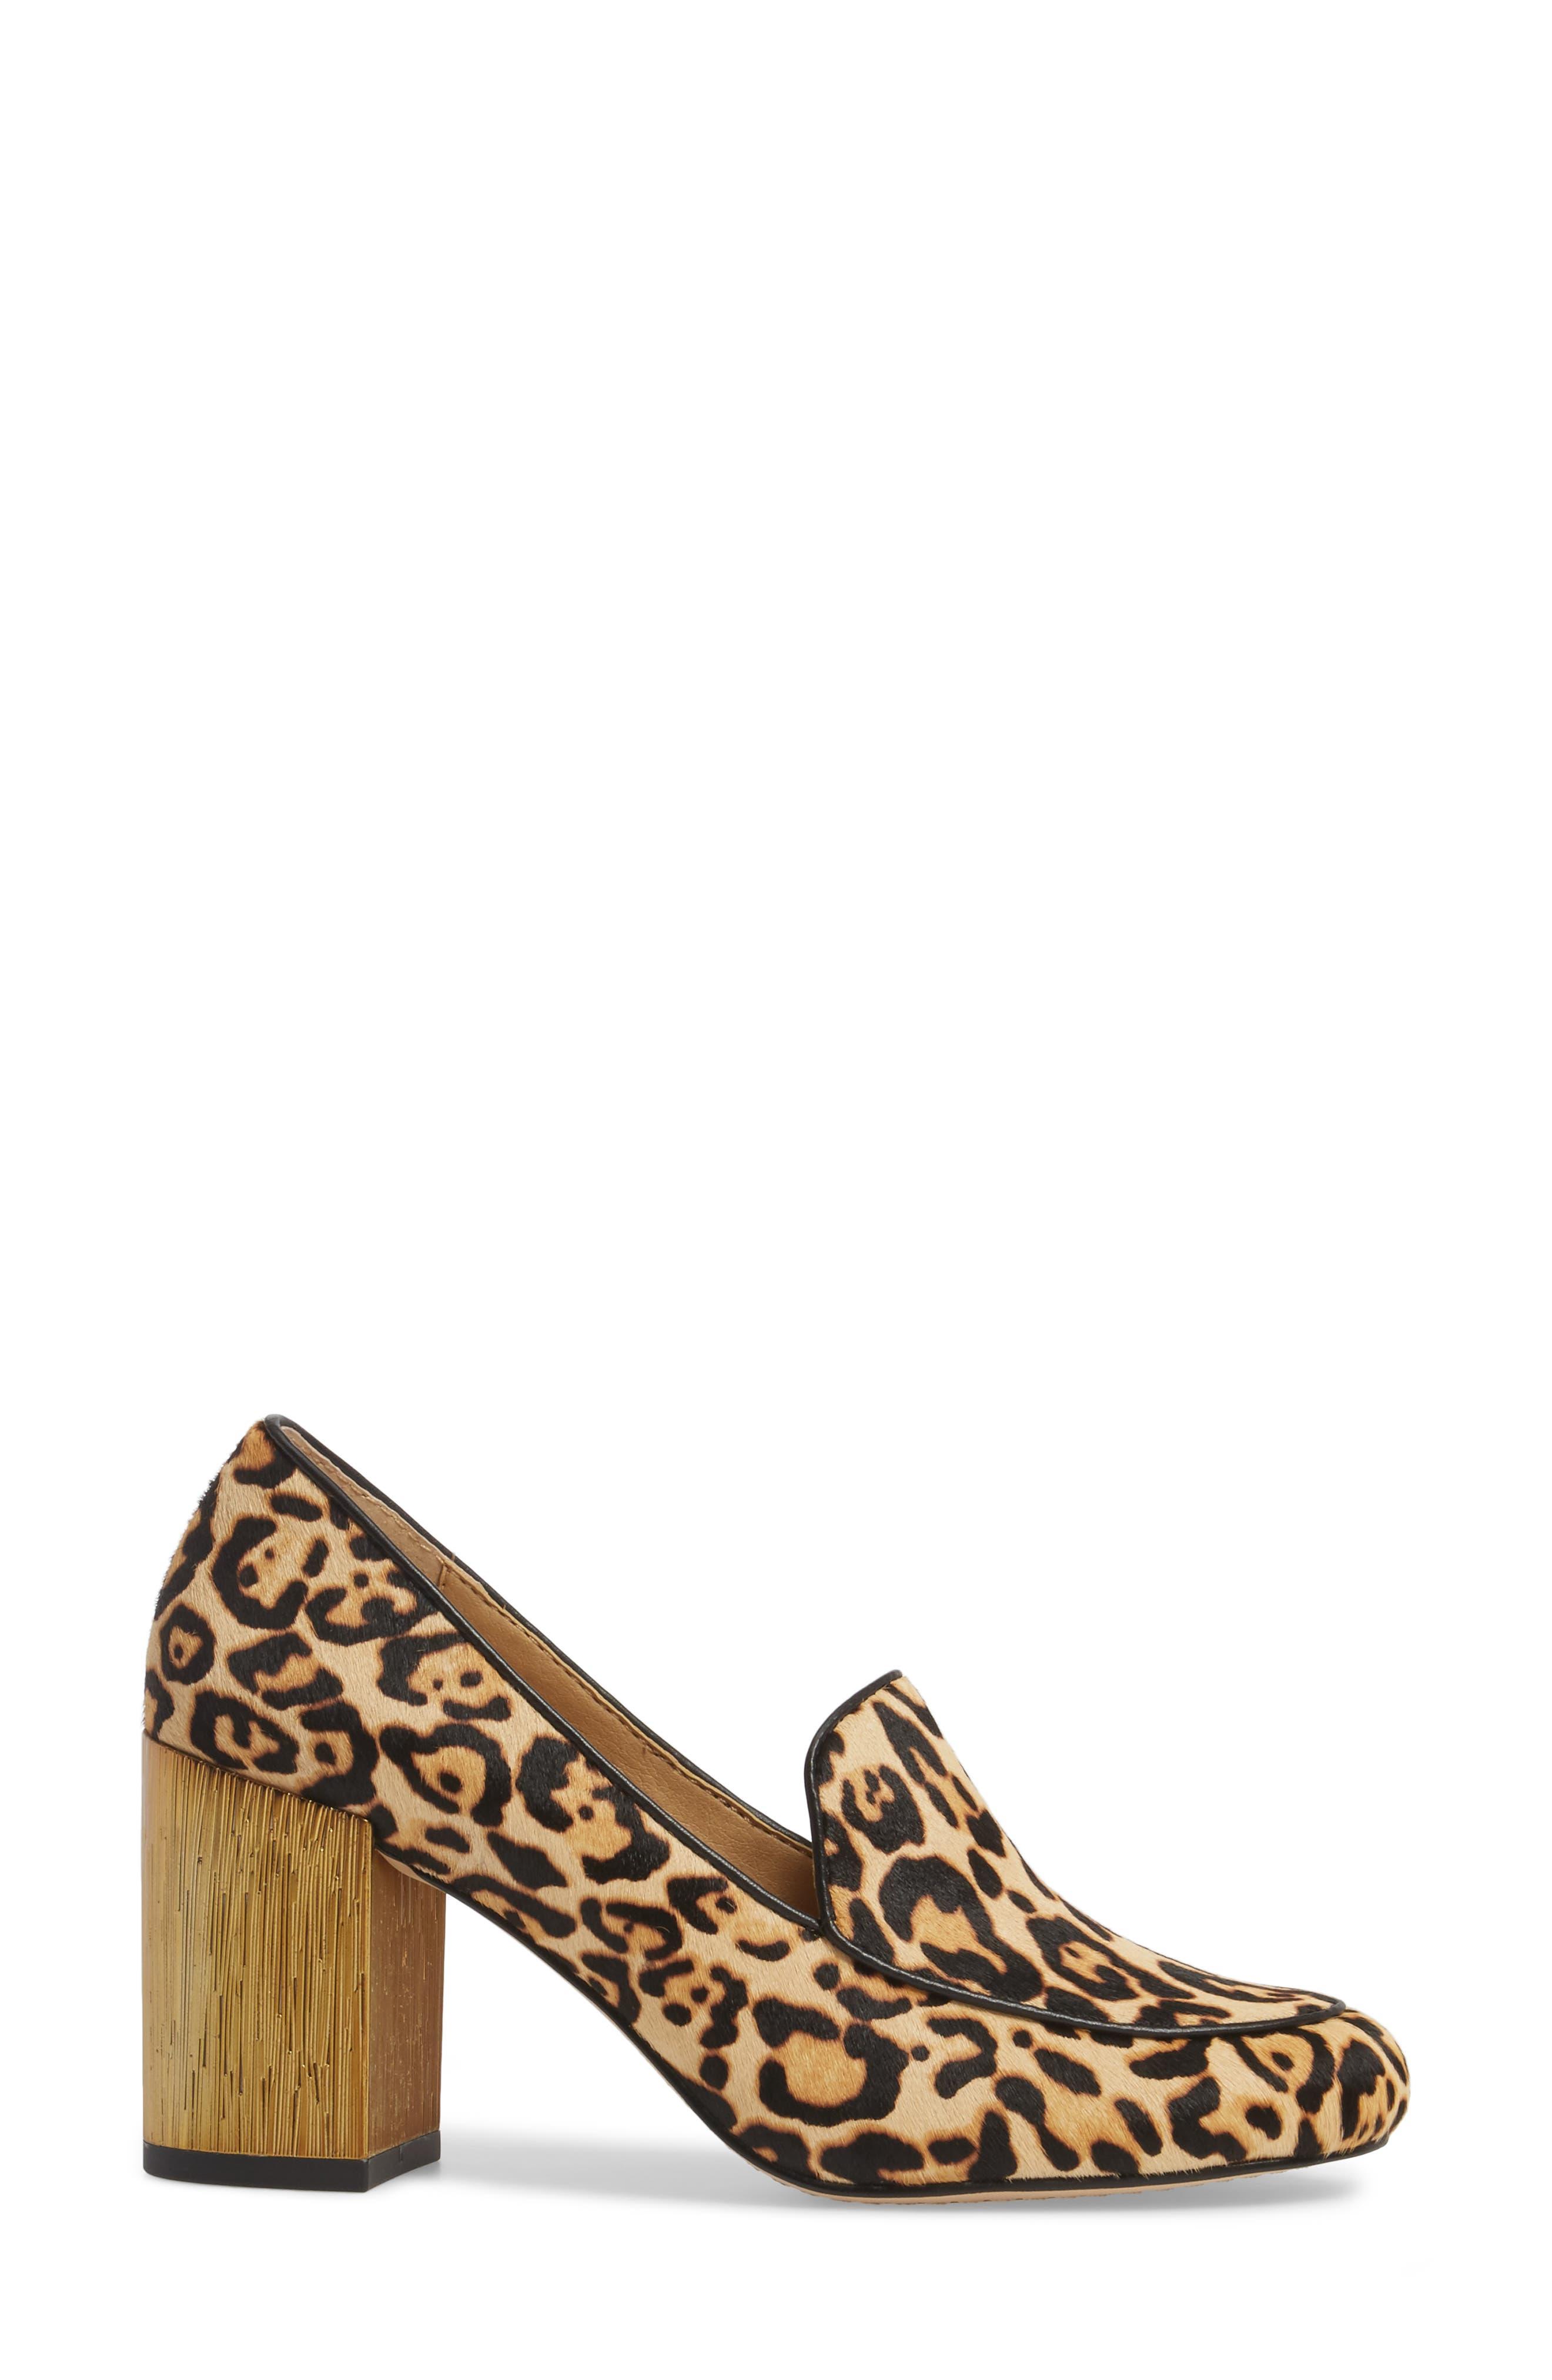 Rosita III Genuine Calf Hair Loafer Pump,                             Alternate thumbnail 3, color,                             200